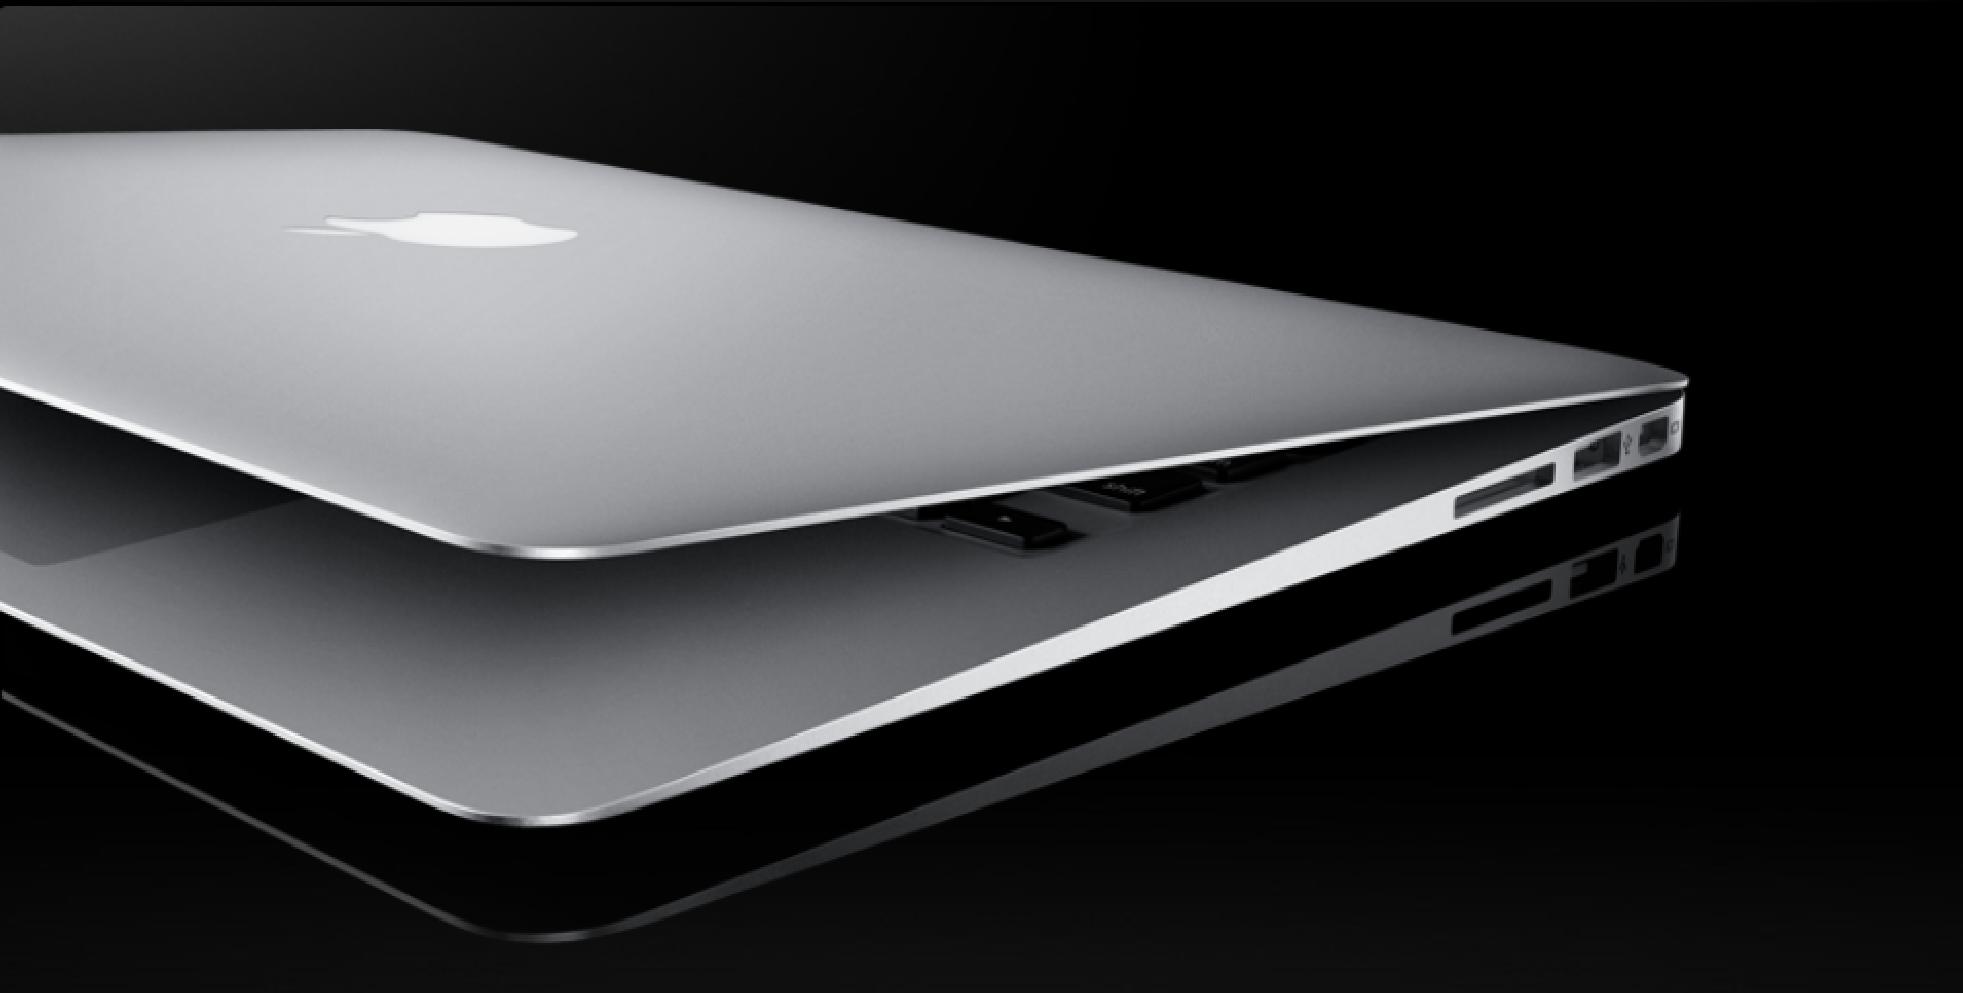 billig macbook air 13